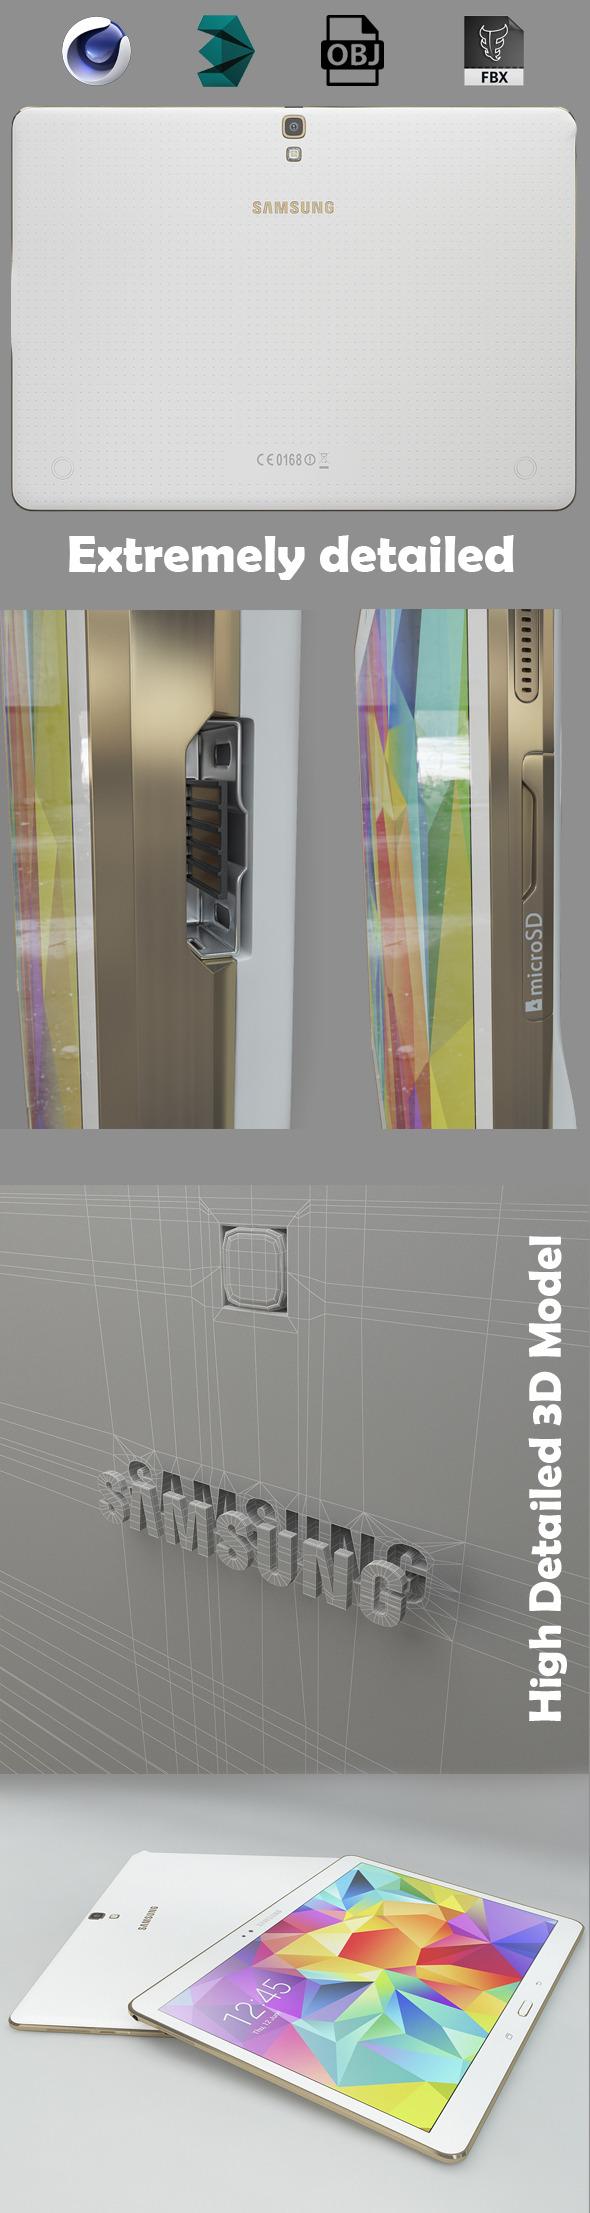 3DOcean Samsung galaxy tab s 10.5 8070728